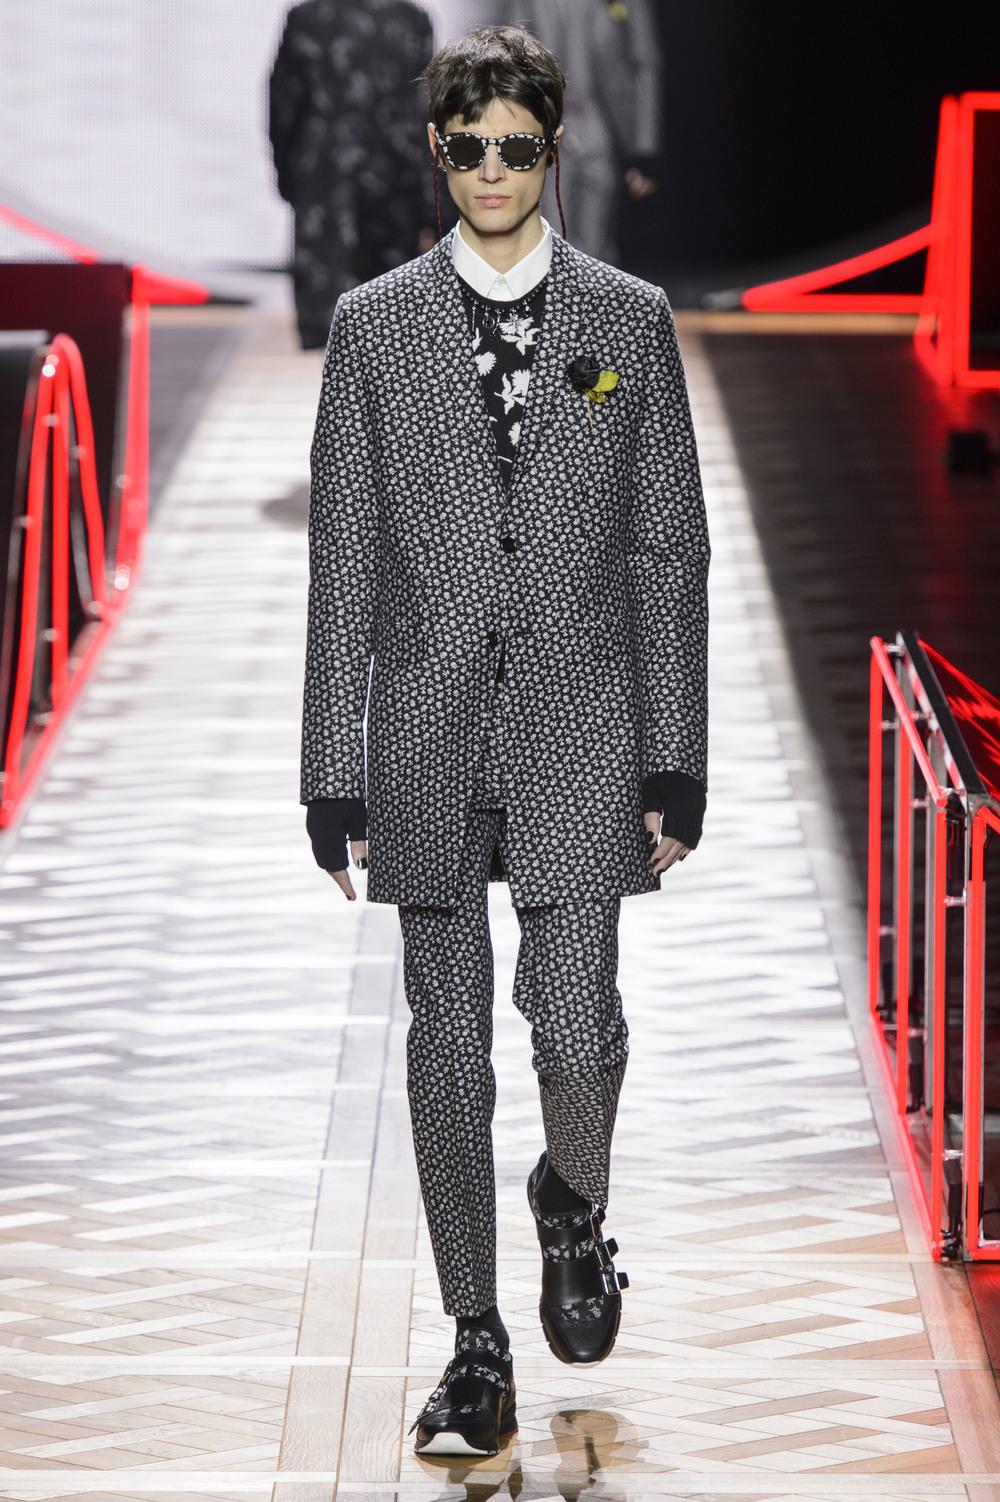 Dior_Homme_Hiver2016-17_look_47.JPG